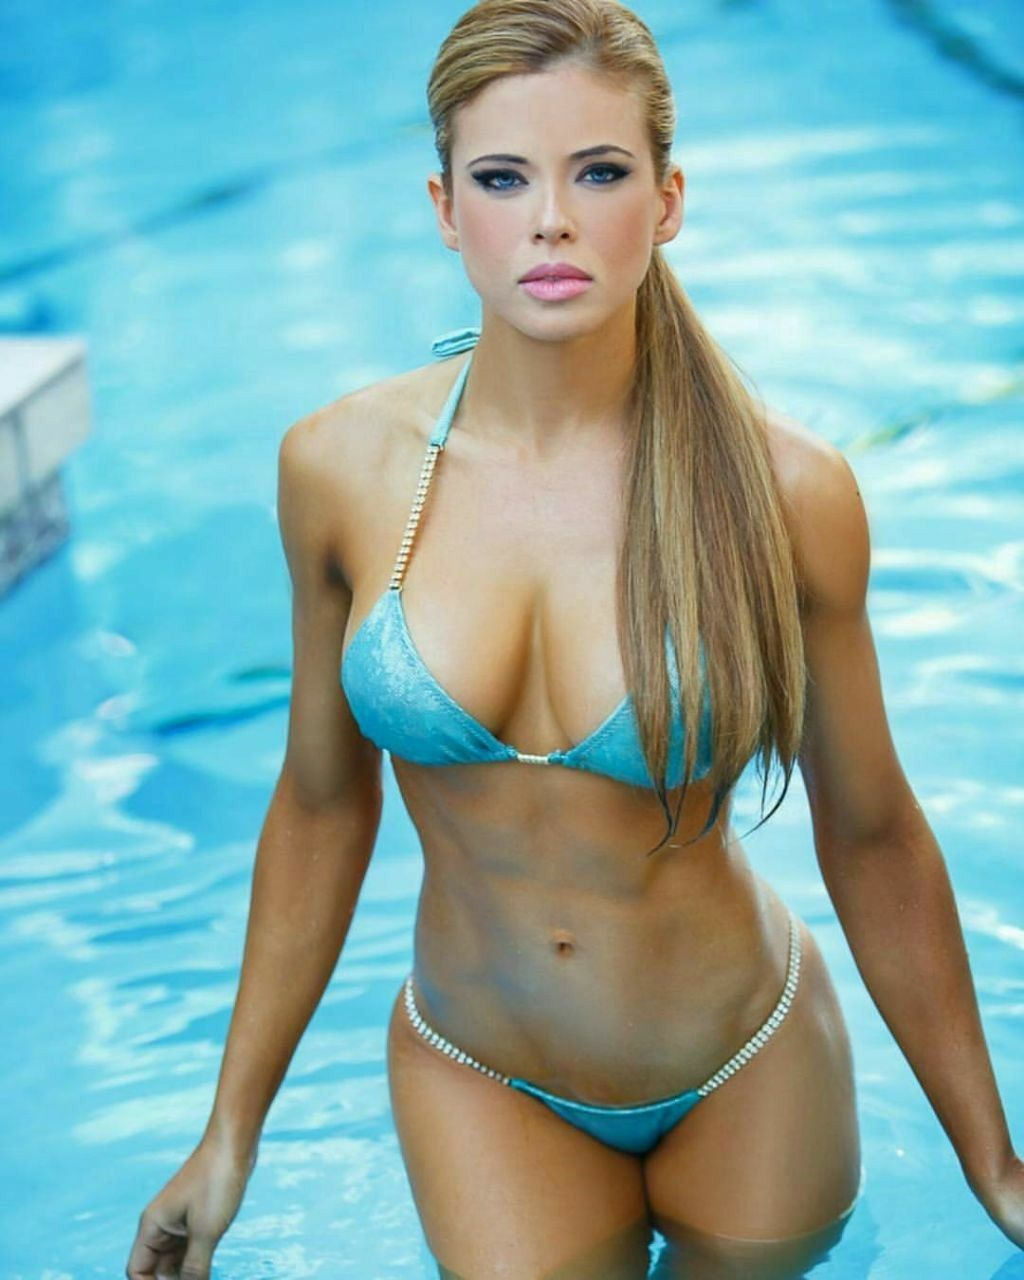 Celebrites Rafaela Ravena nudes (19 foto and video), Tits, Bikini, Selfie, butt 2020